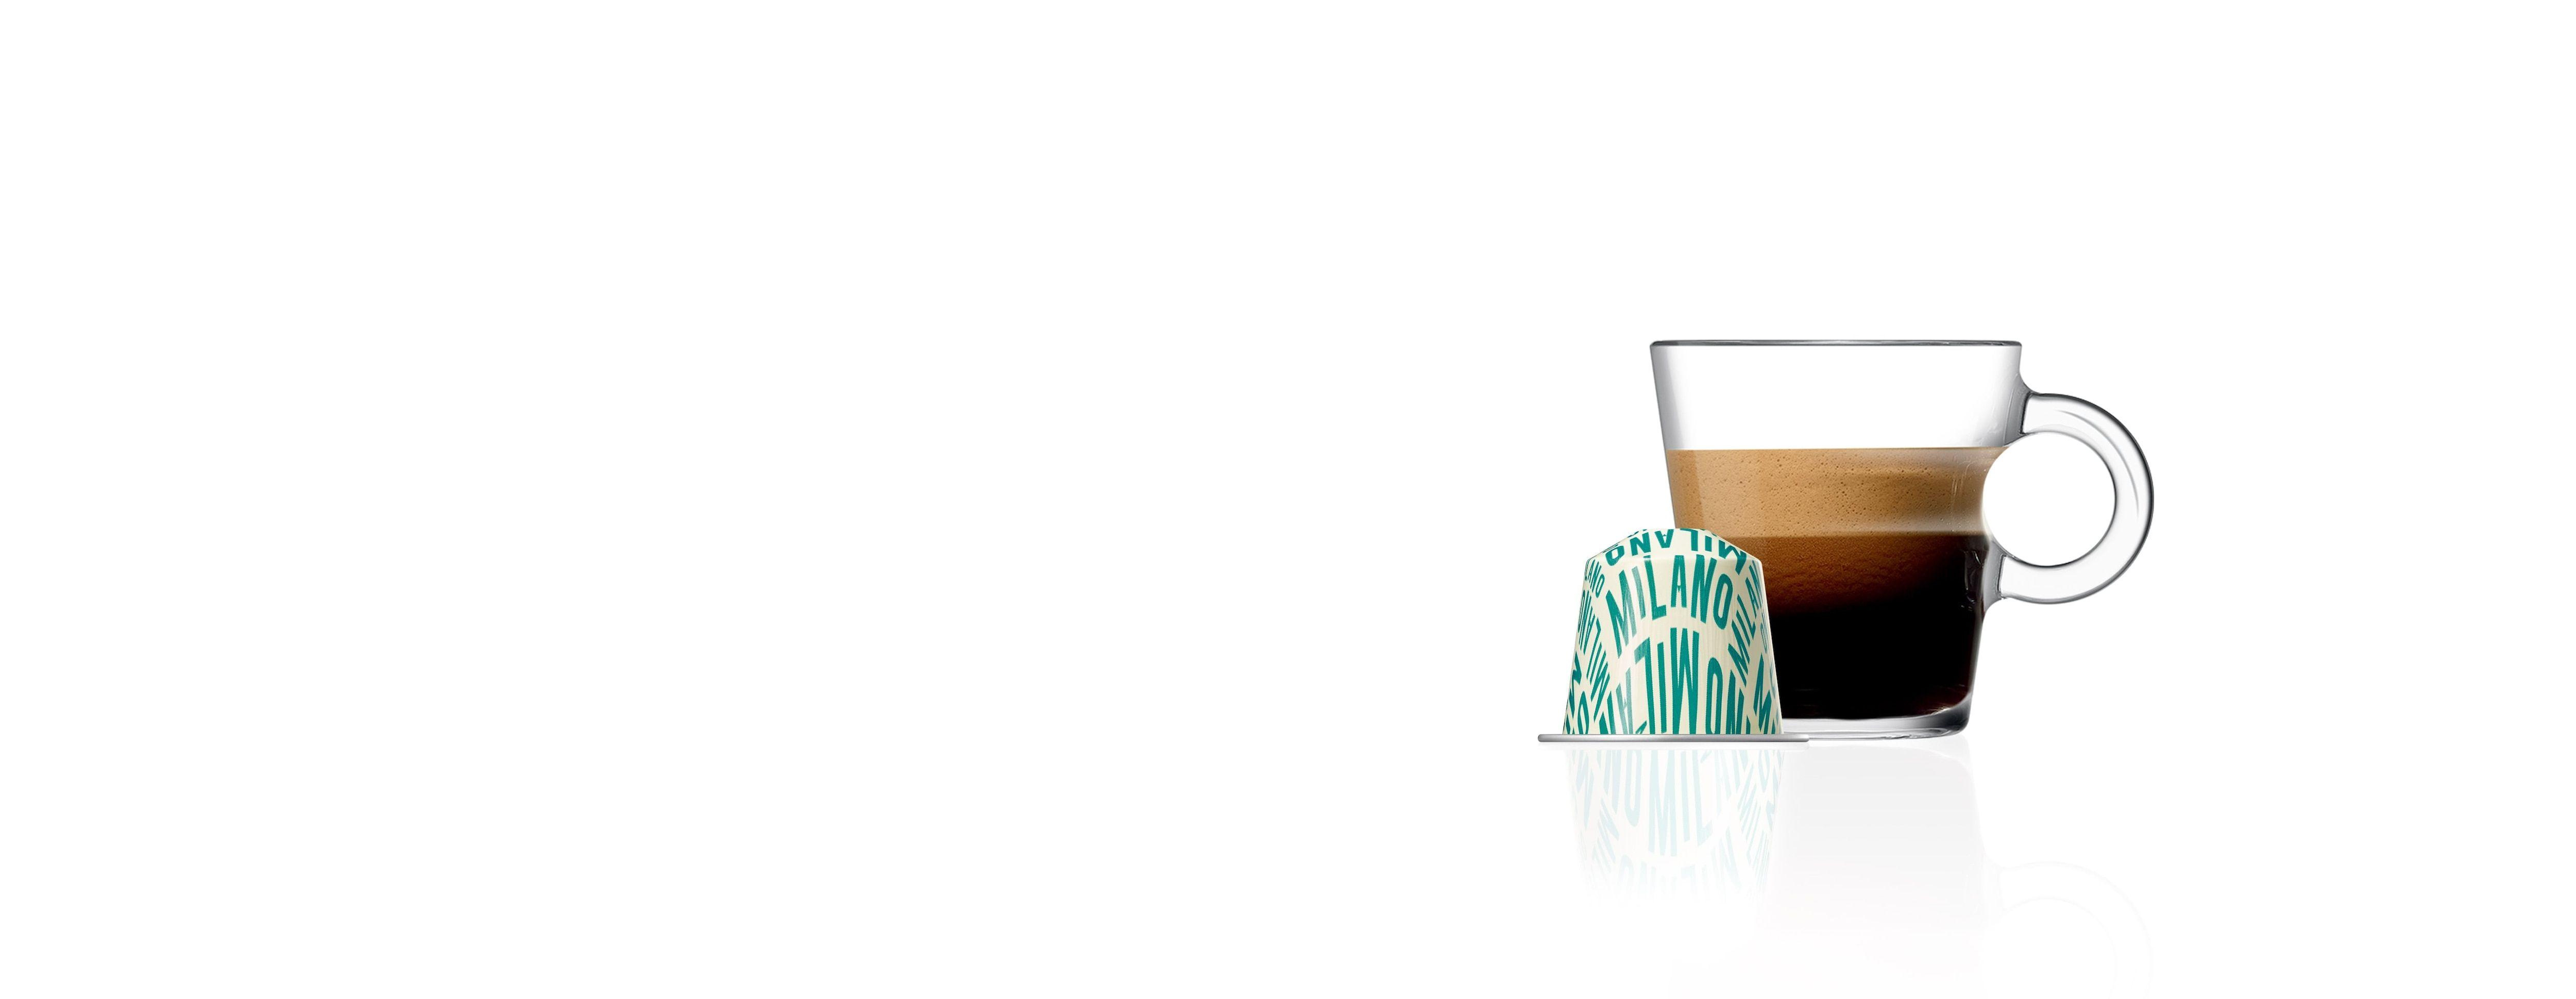 Café Milano Tribute to Milano Coffee Pods Nespresso